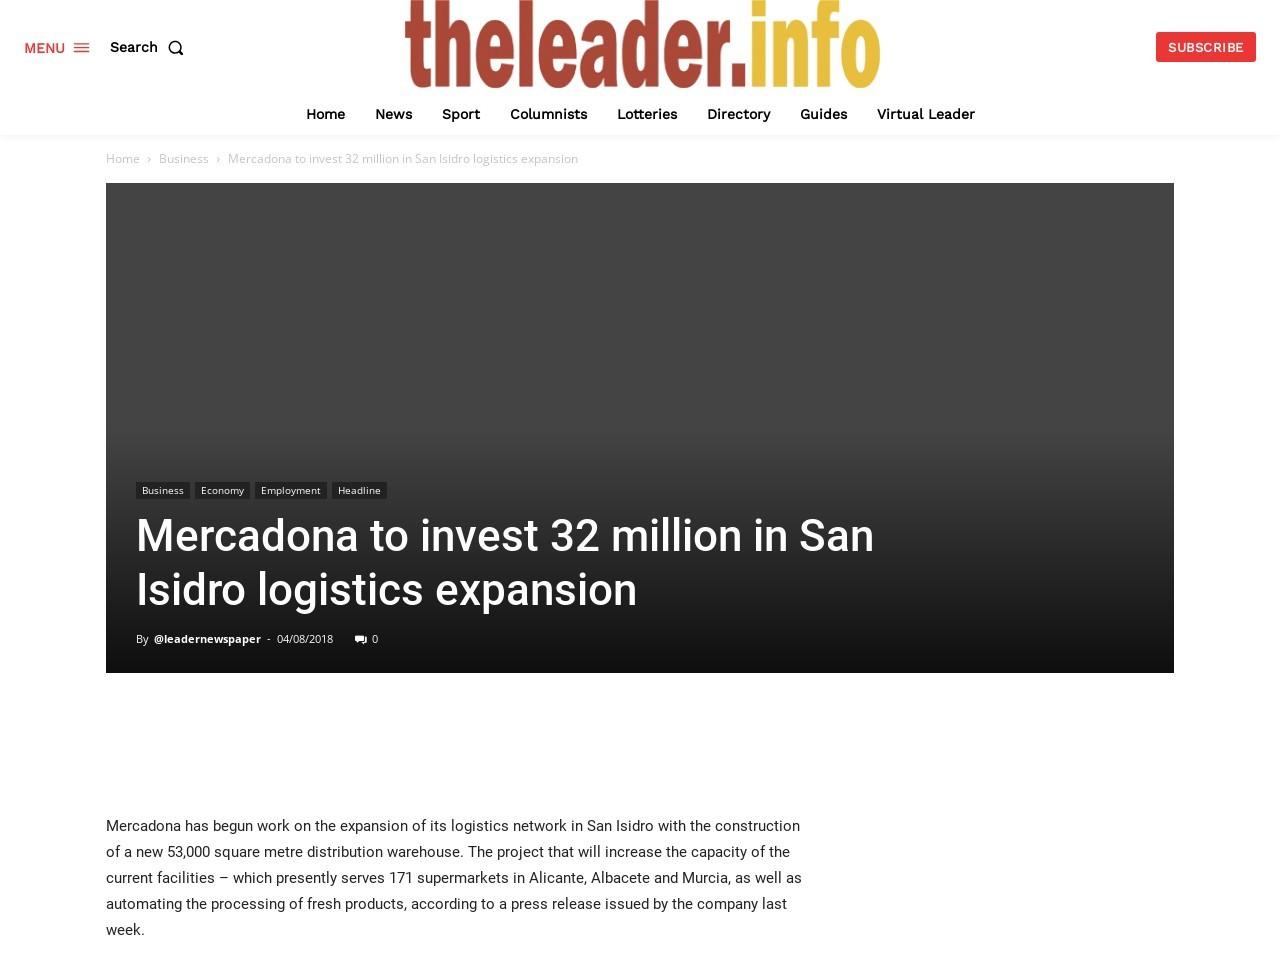 Mercadona to invest 32 million in San Isidro logistics expansion